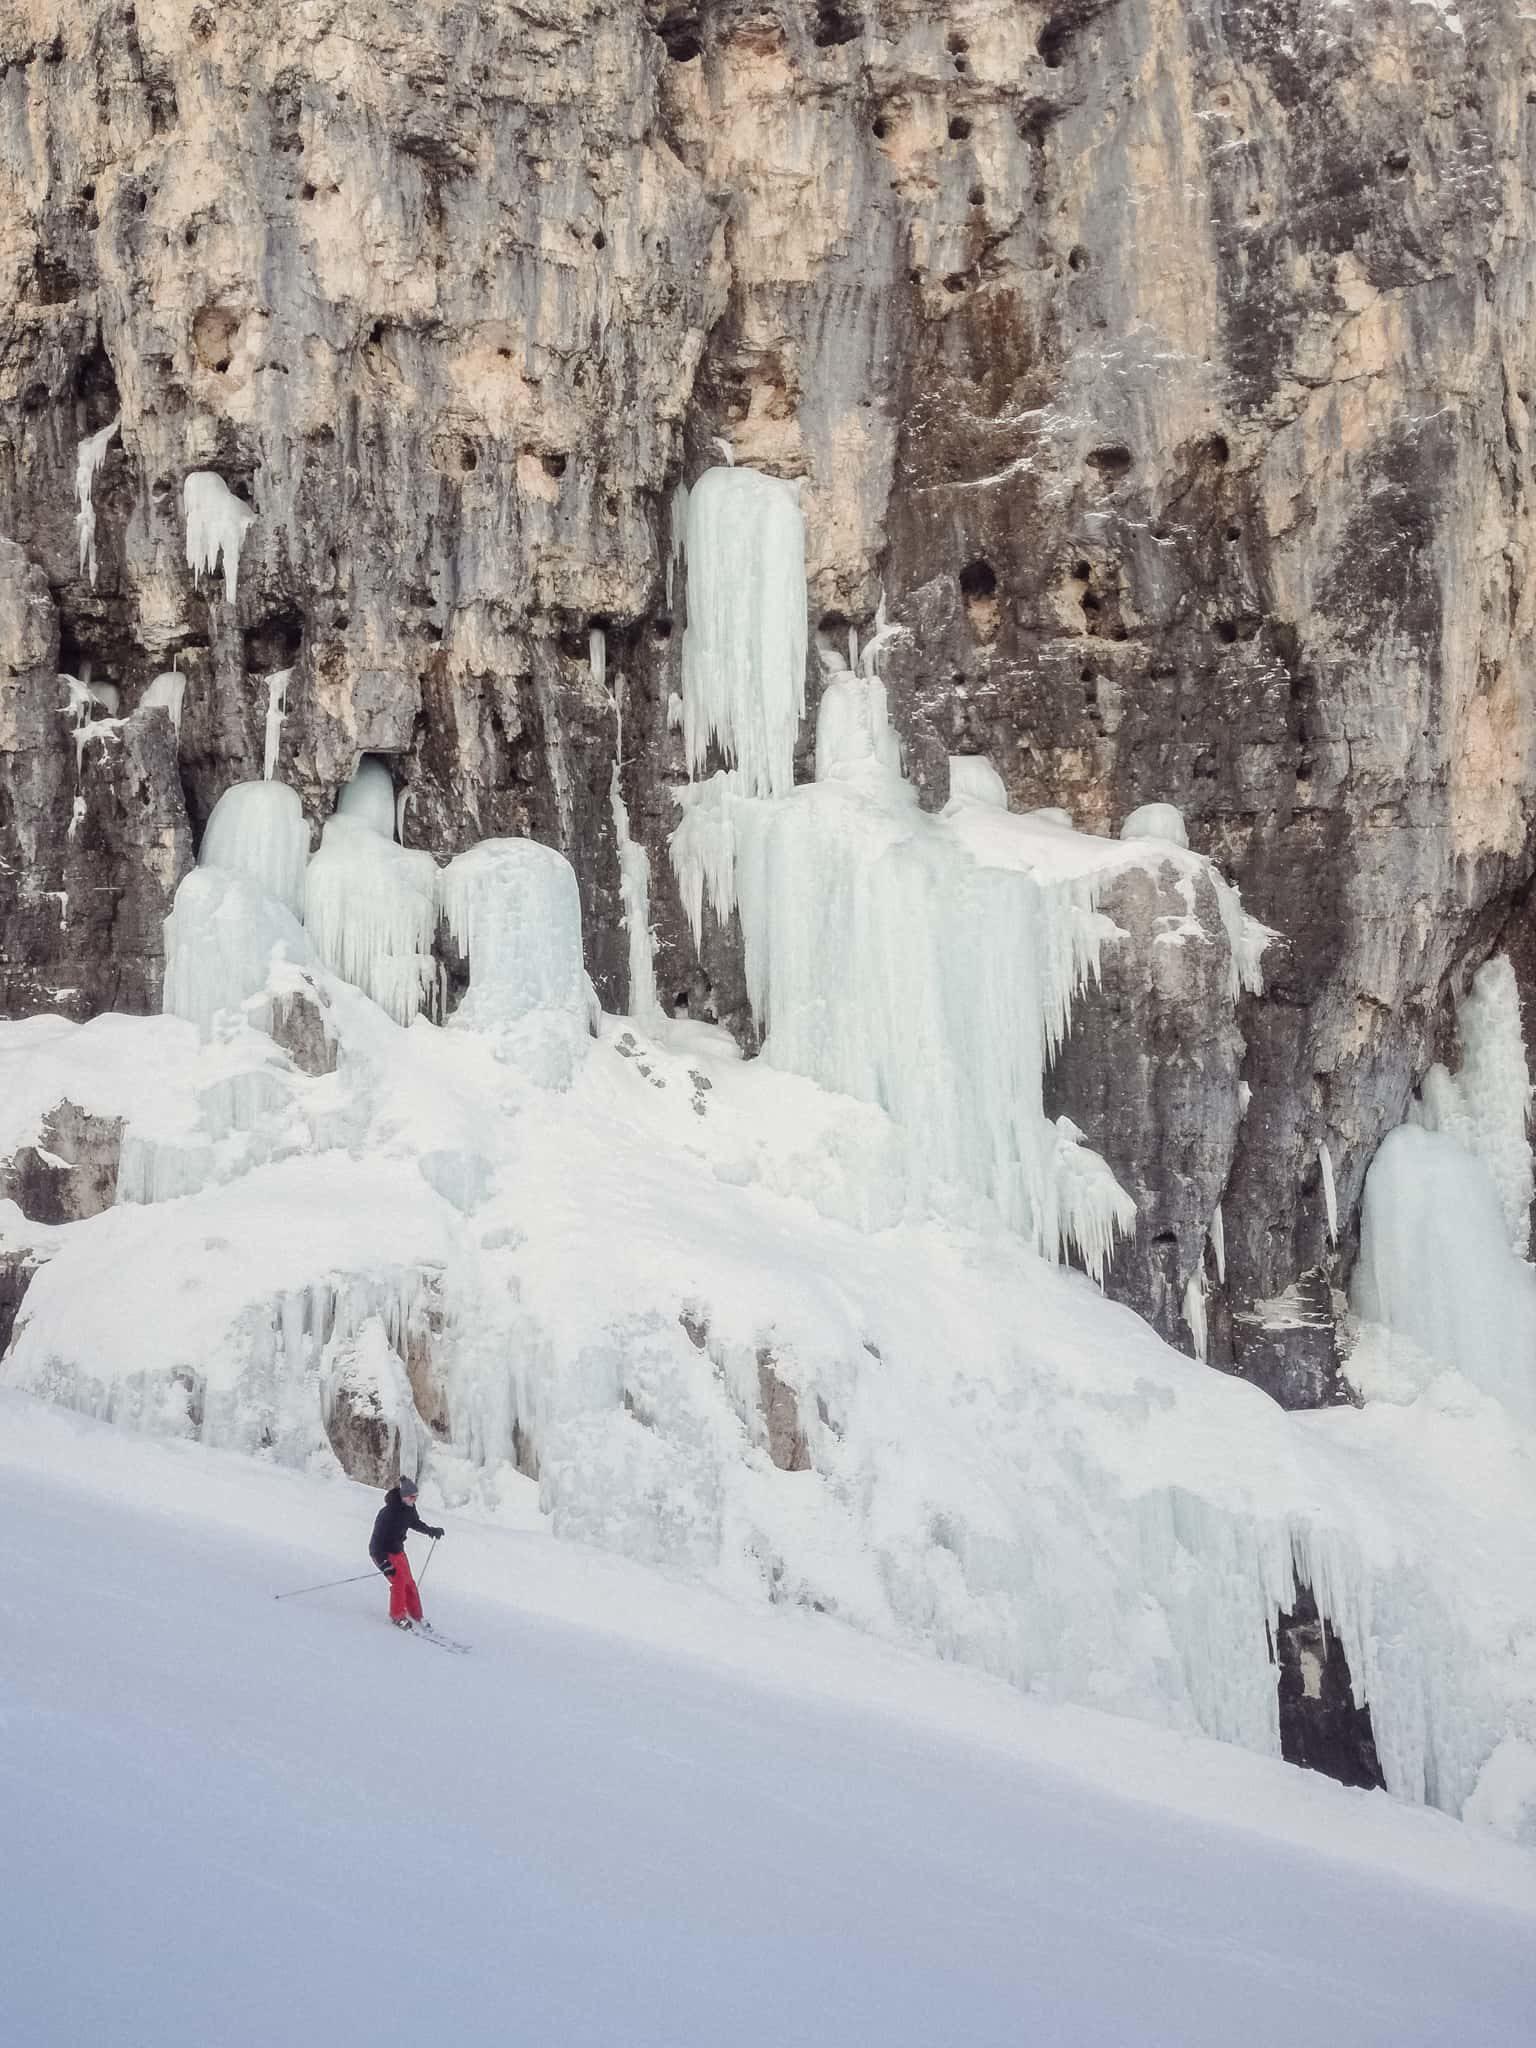 Cascate di ghiaccio lungo l'Armentarola